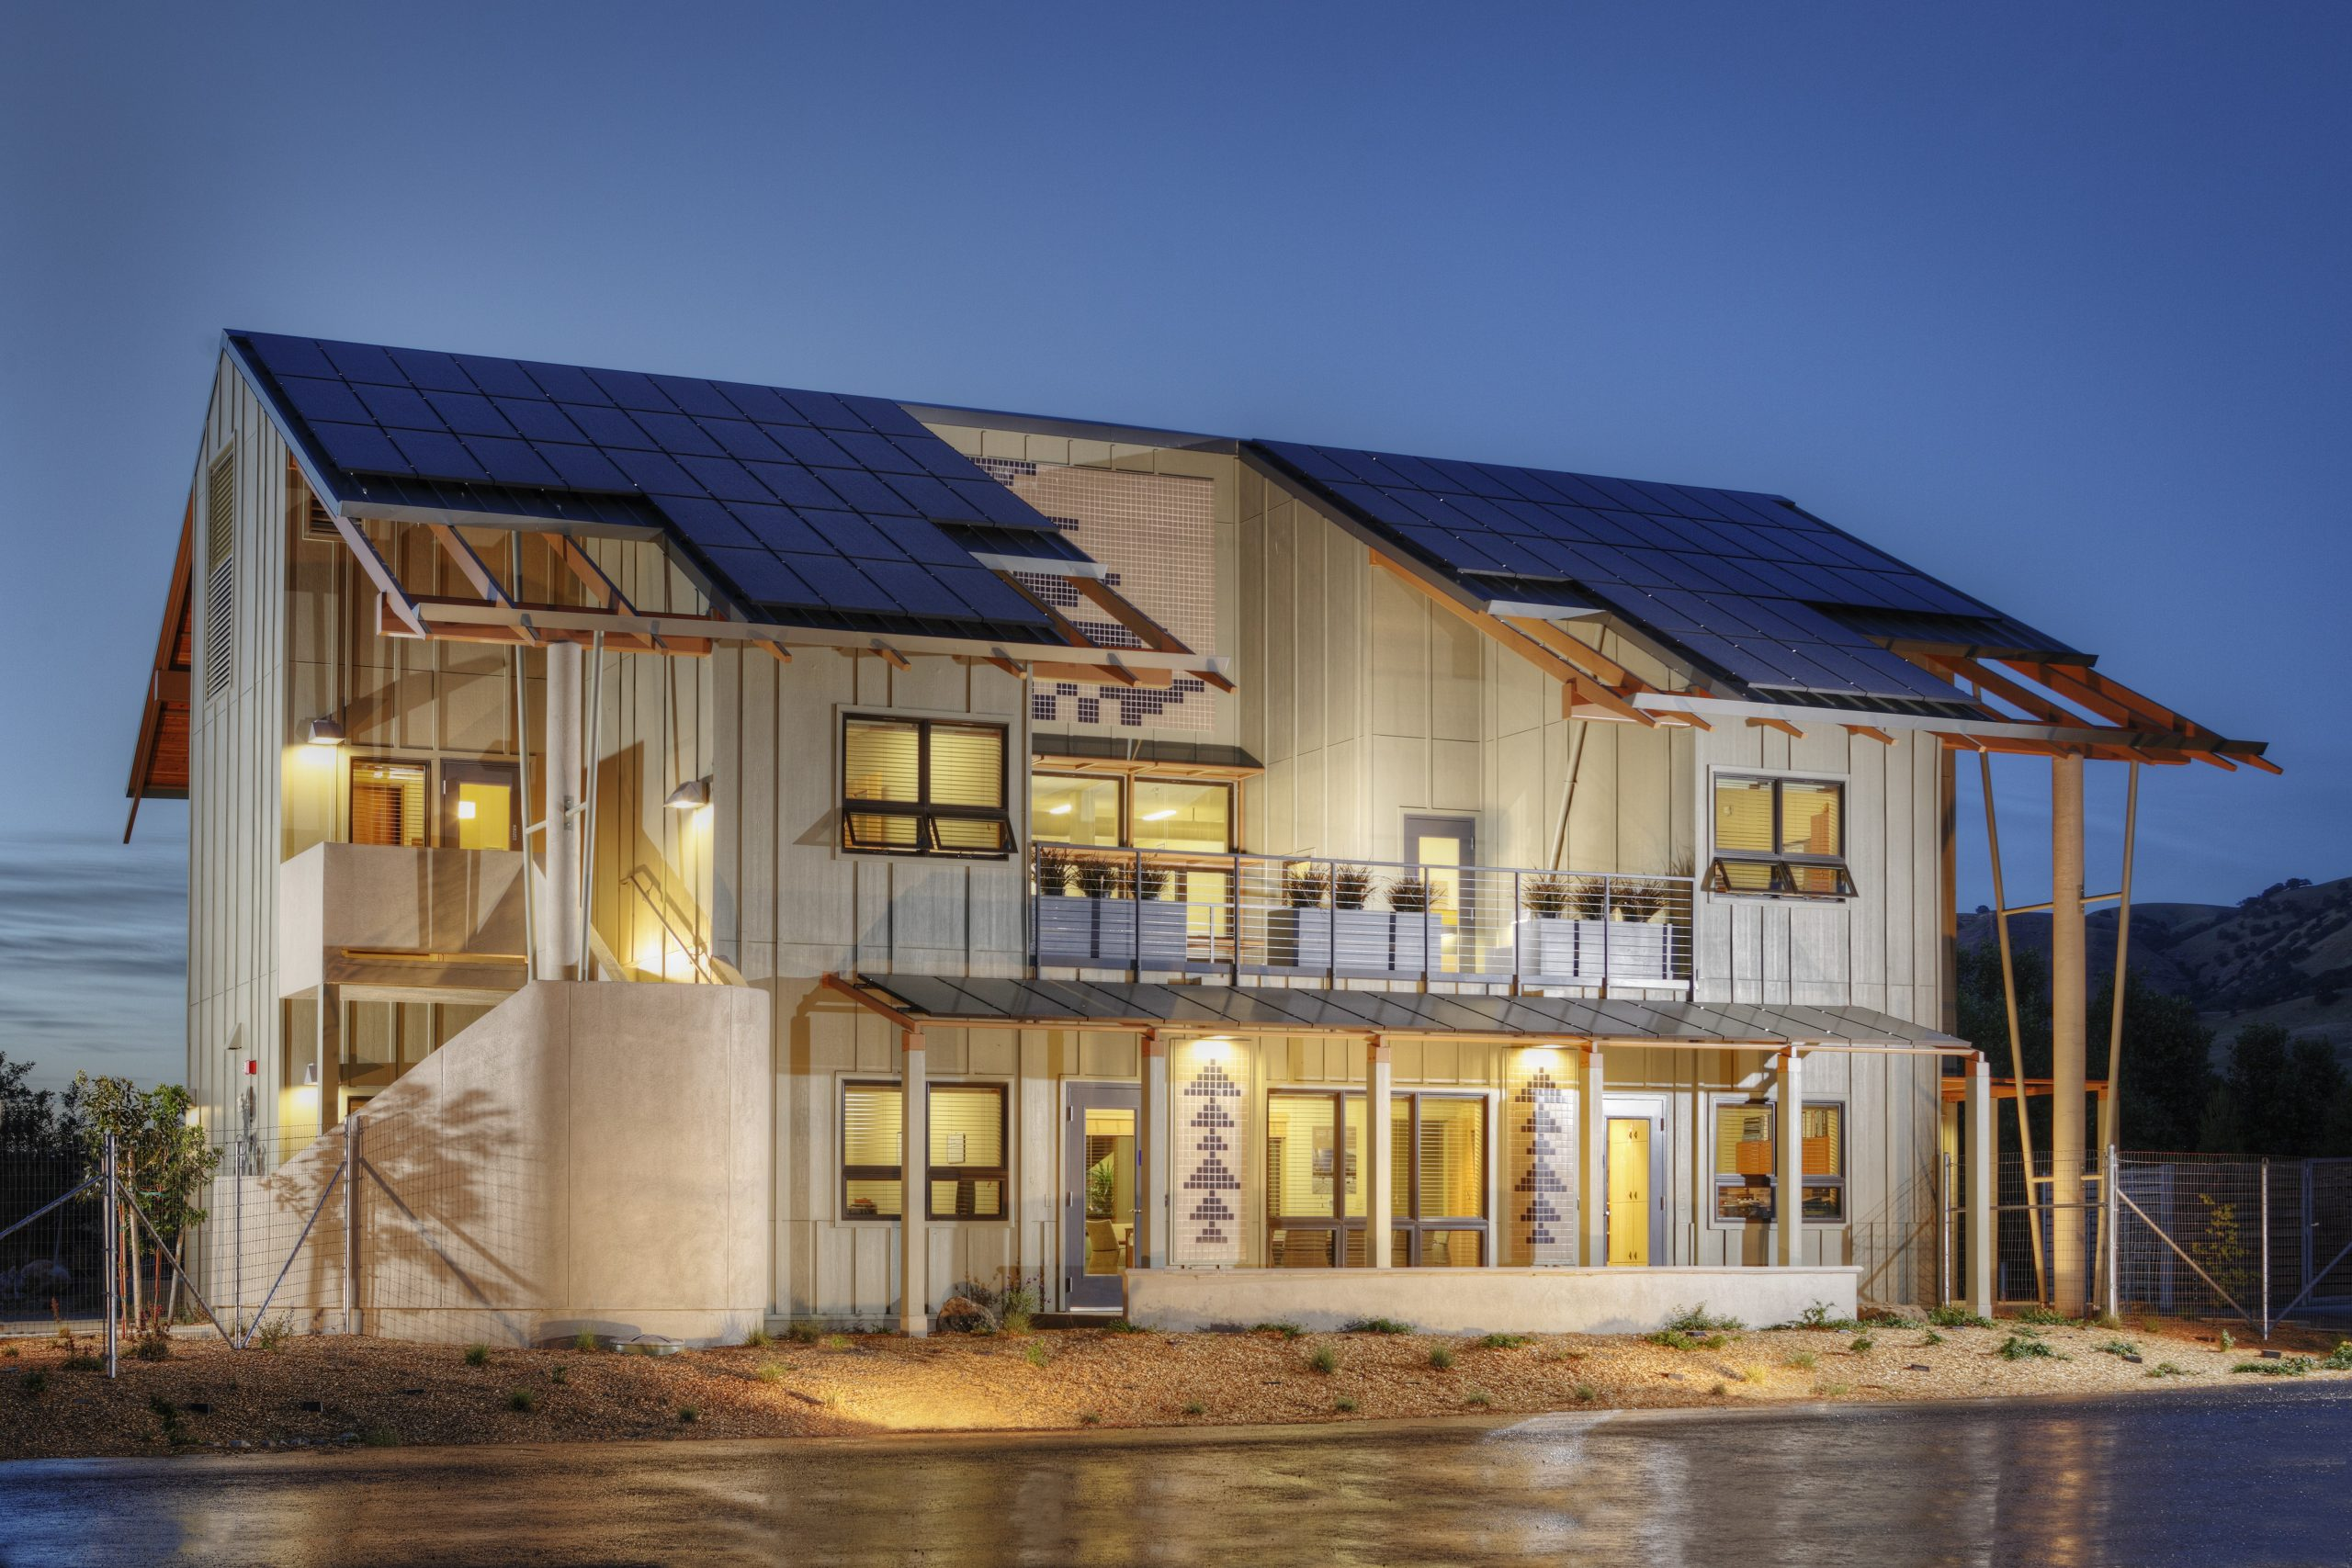 Yocha Dehe Wintun Nation Facility Office Building